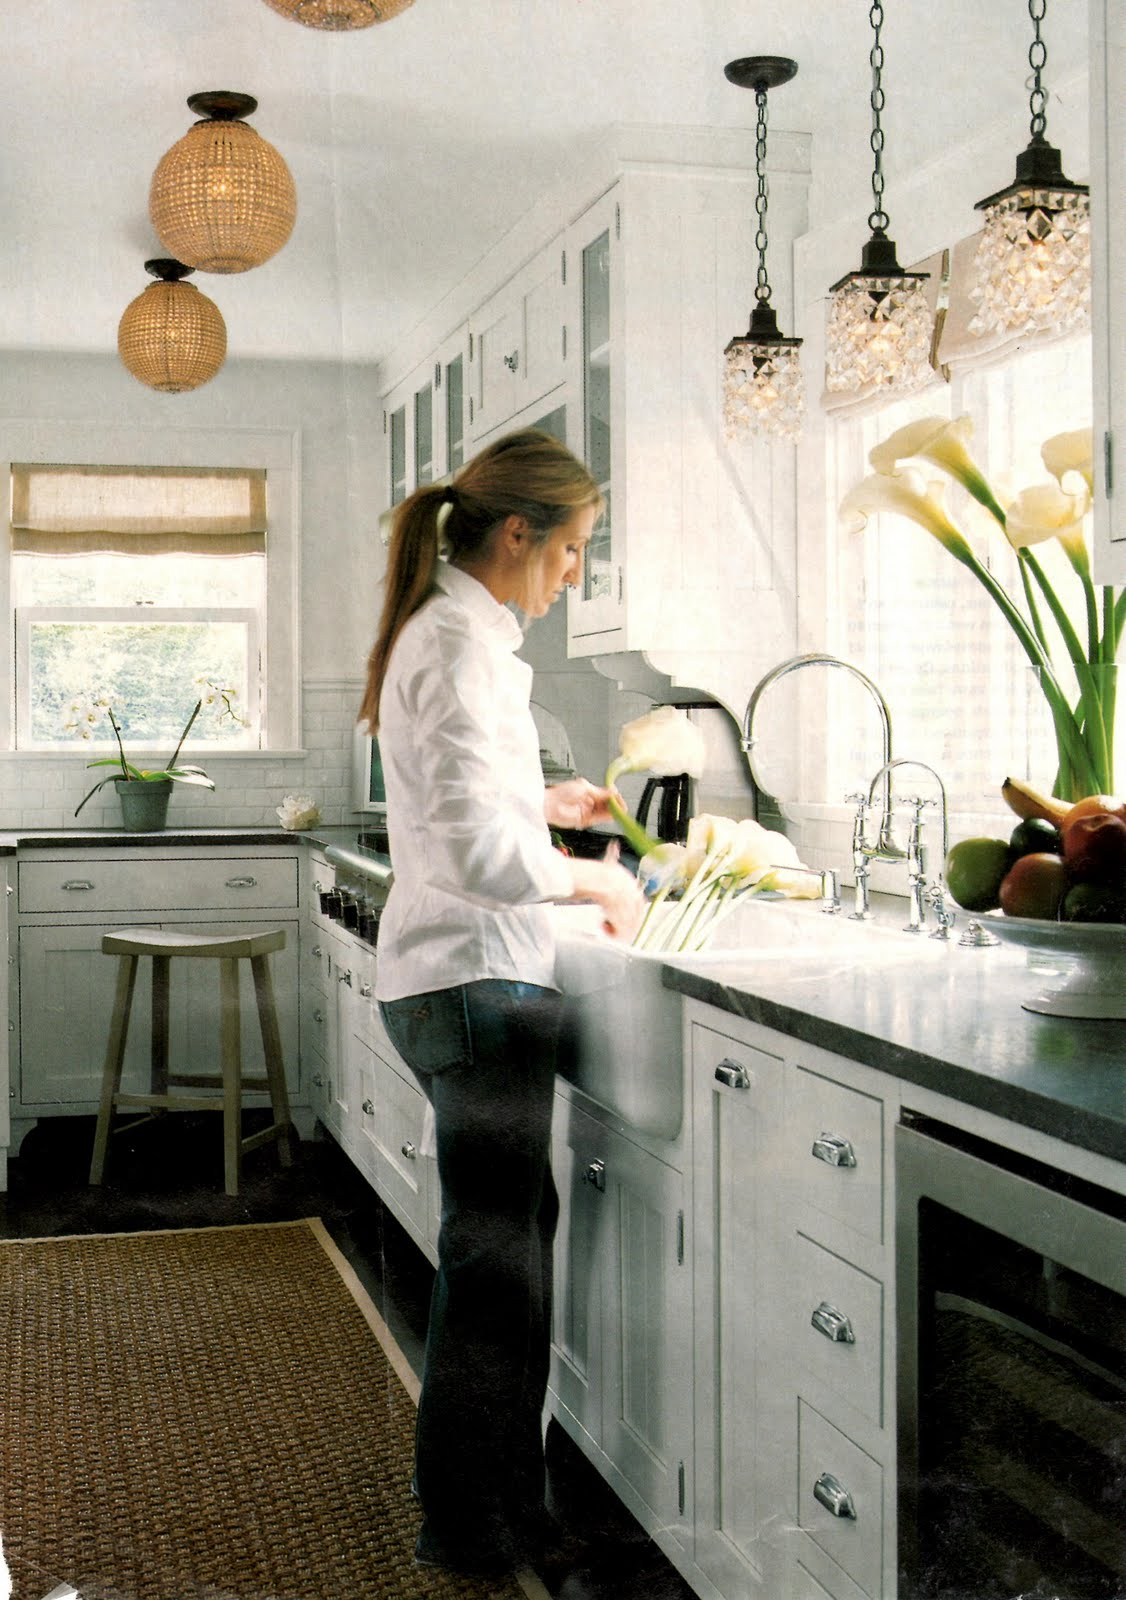 pendants over the kitchen sink - Design ManifestDesign Manifest